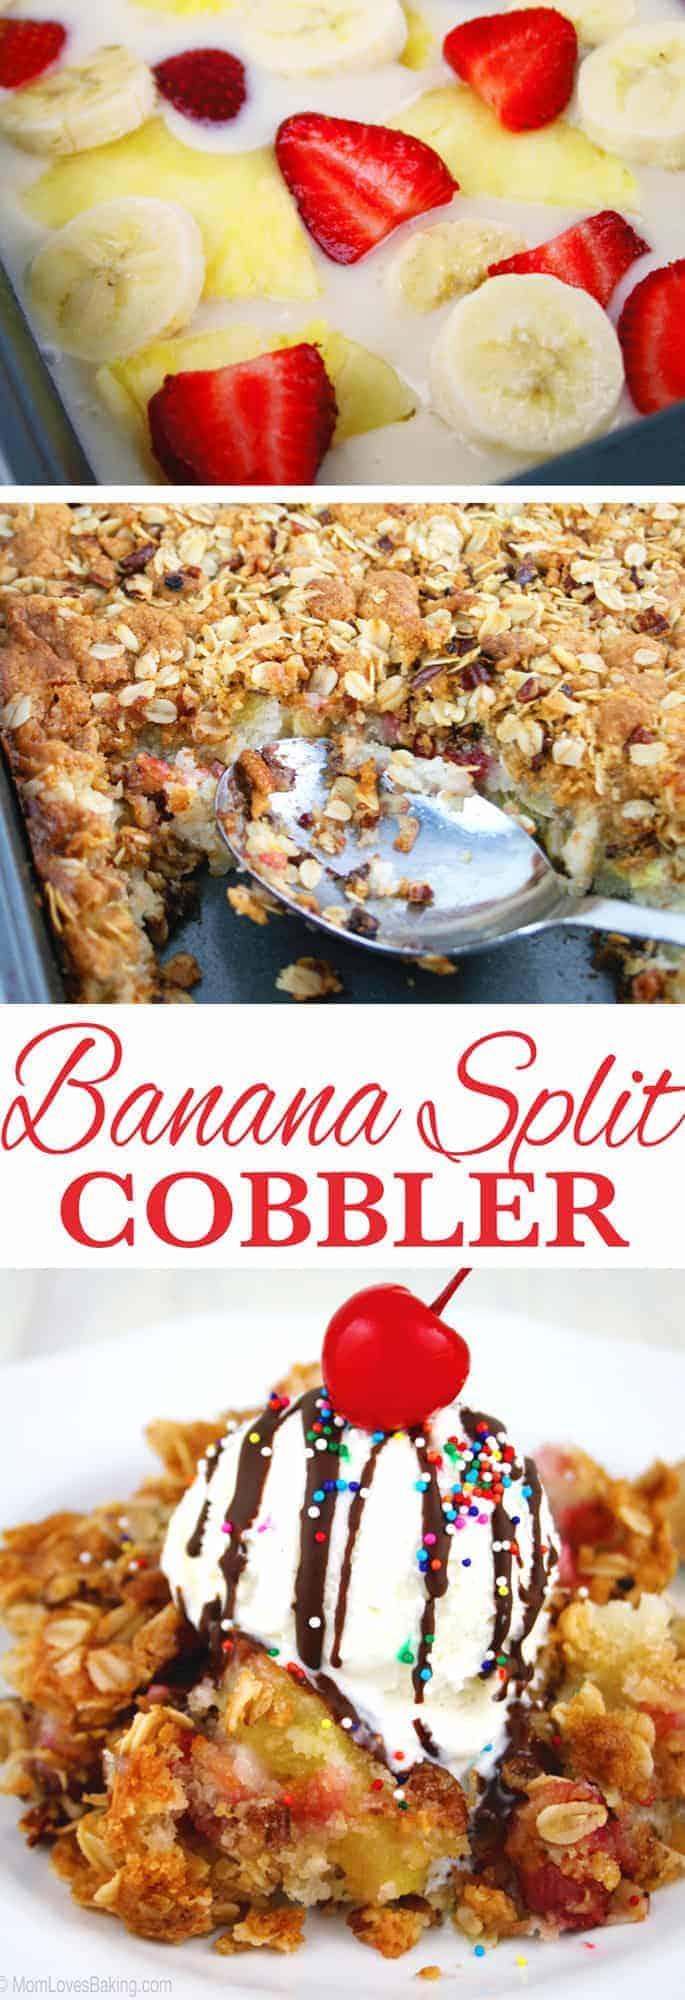 Banana Split Cobbler